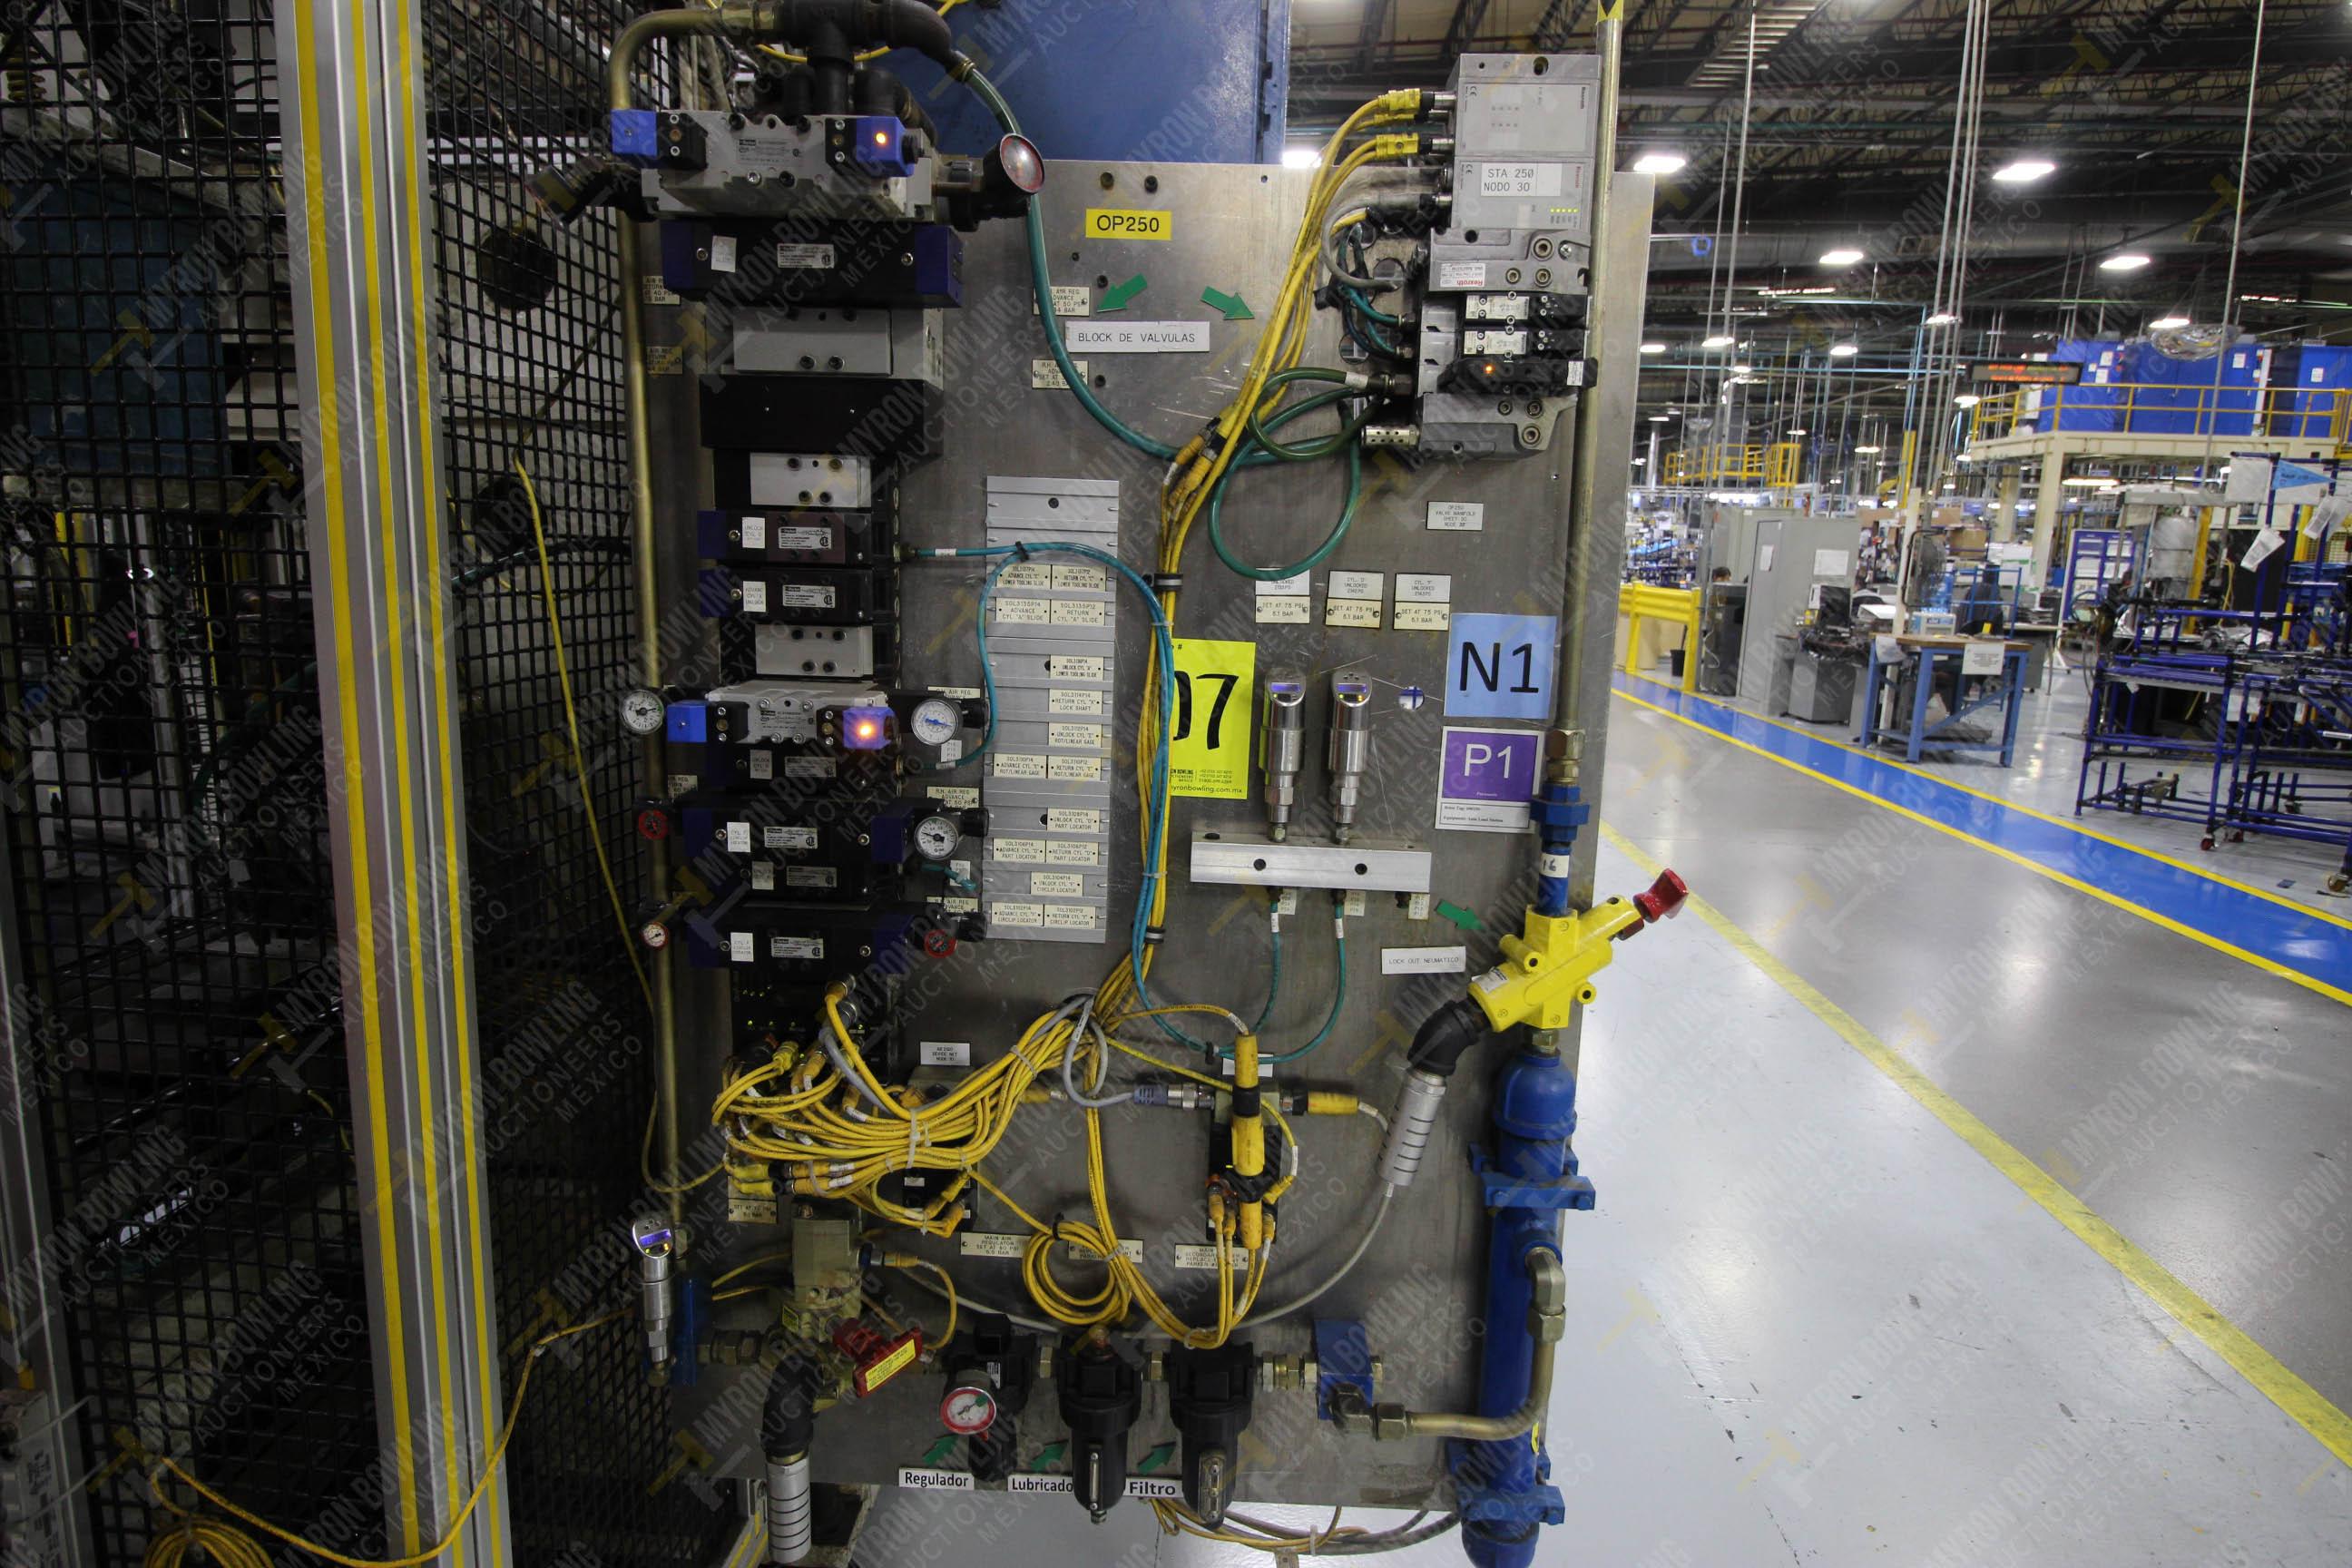 Estación semiautomática para operación 250 de ensamble de candado, contiene - Image 11 of 21